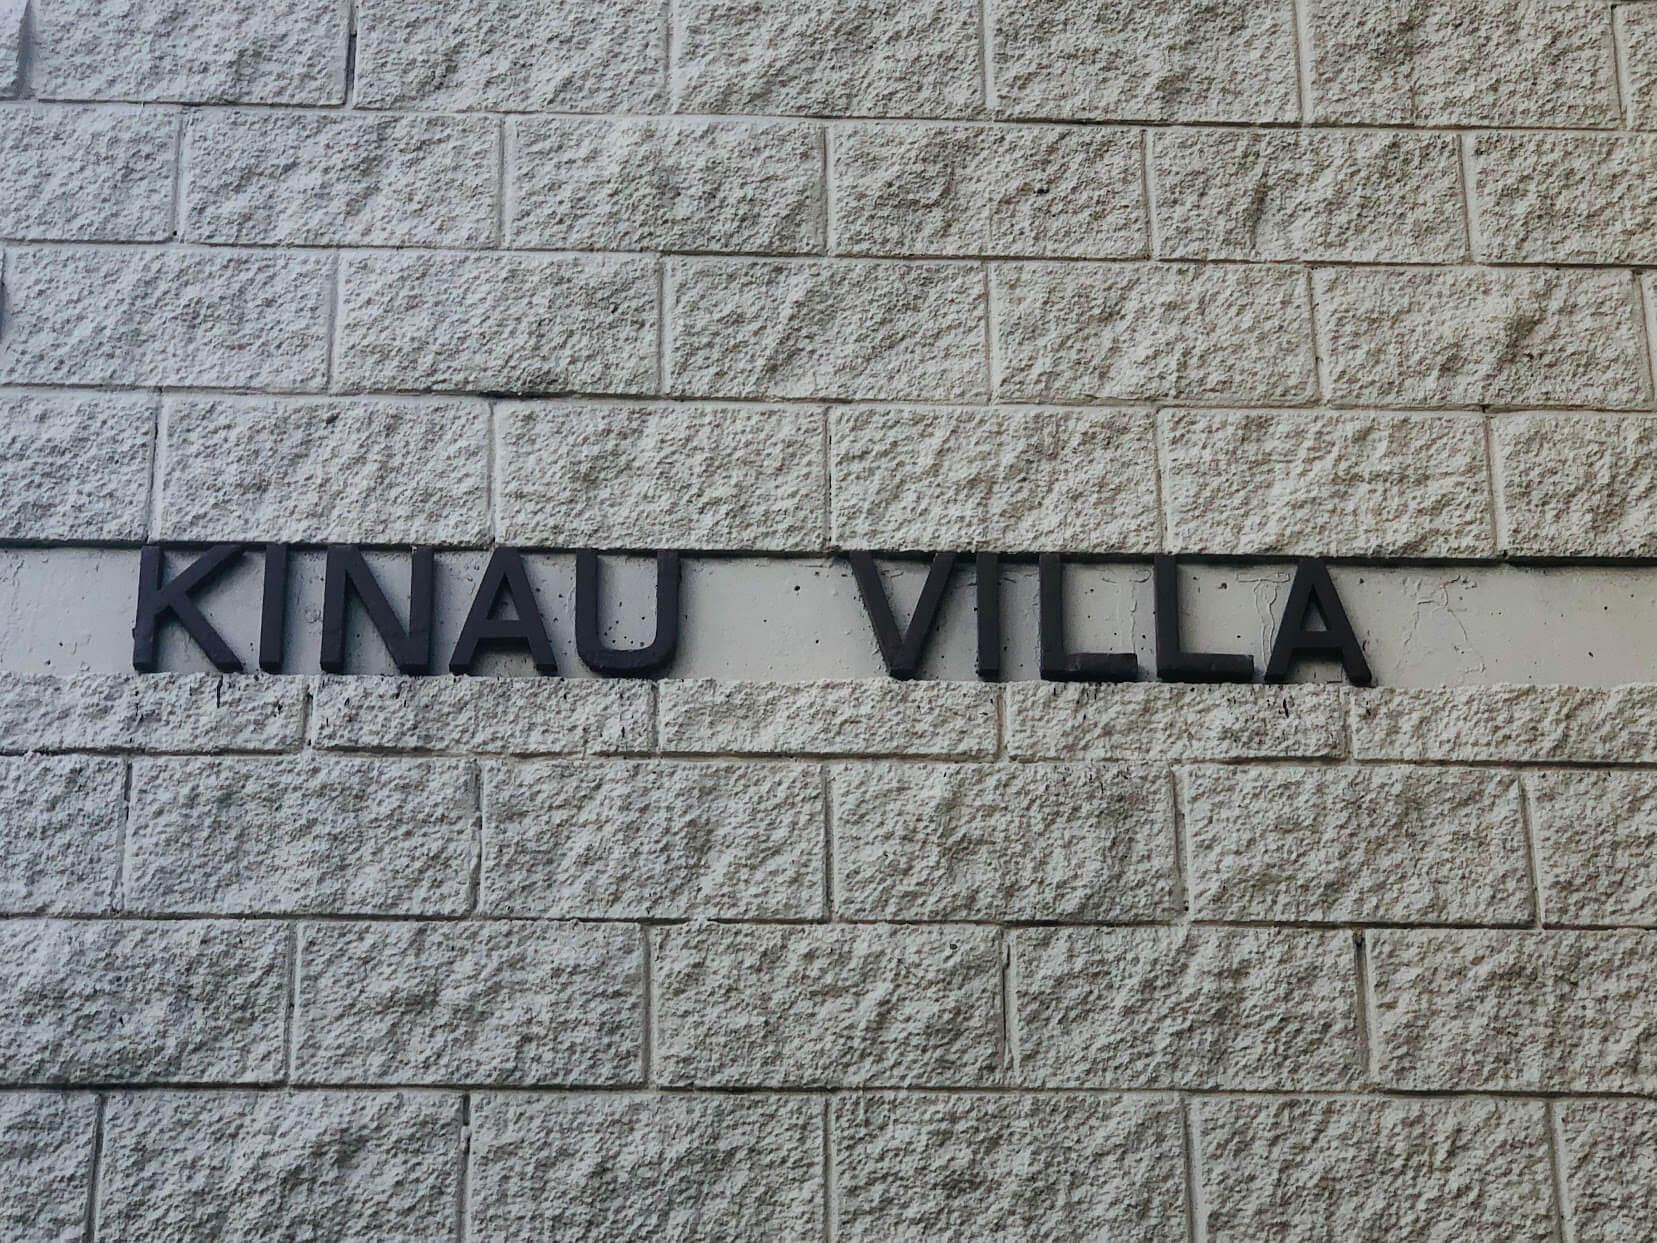 Kinau Villaの看板